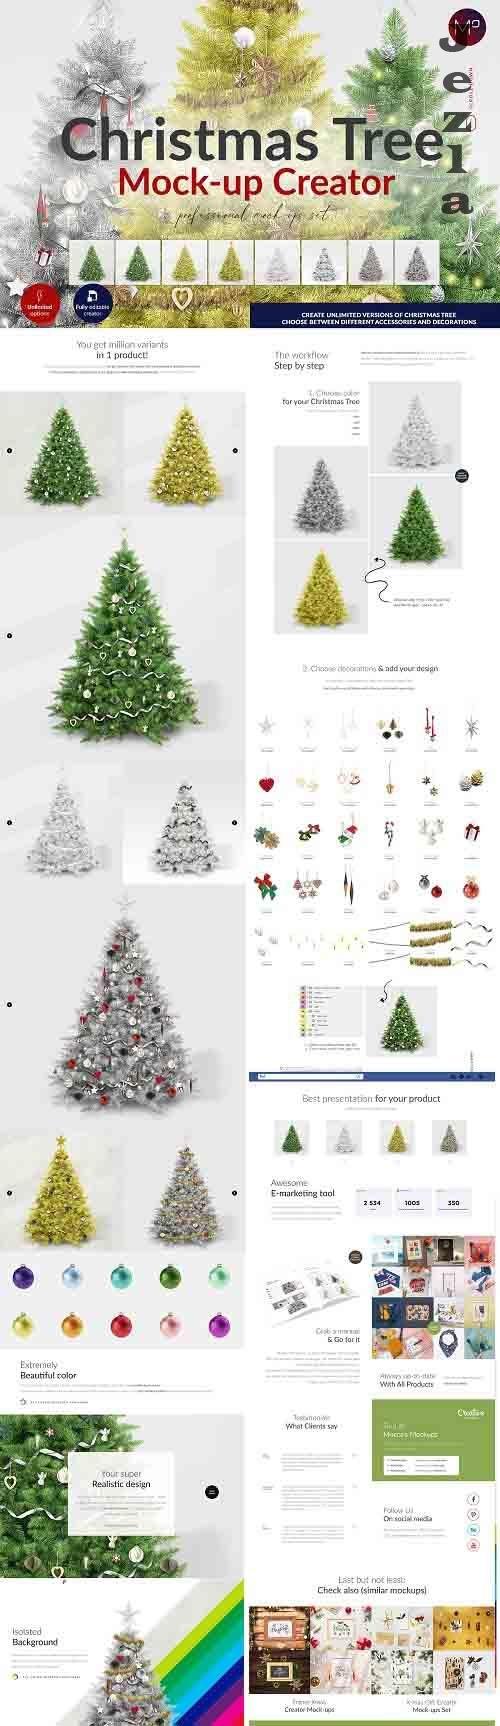 CreativeMarket - Christmas Tree Creator Mock-up 5580357